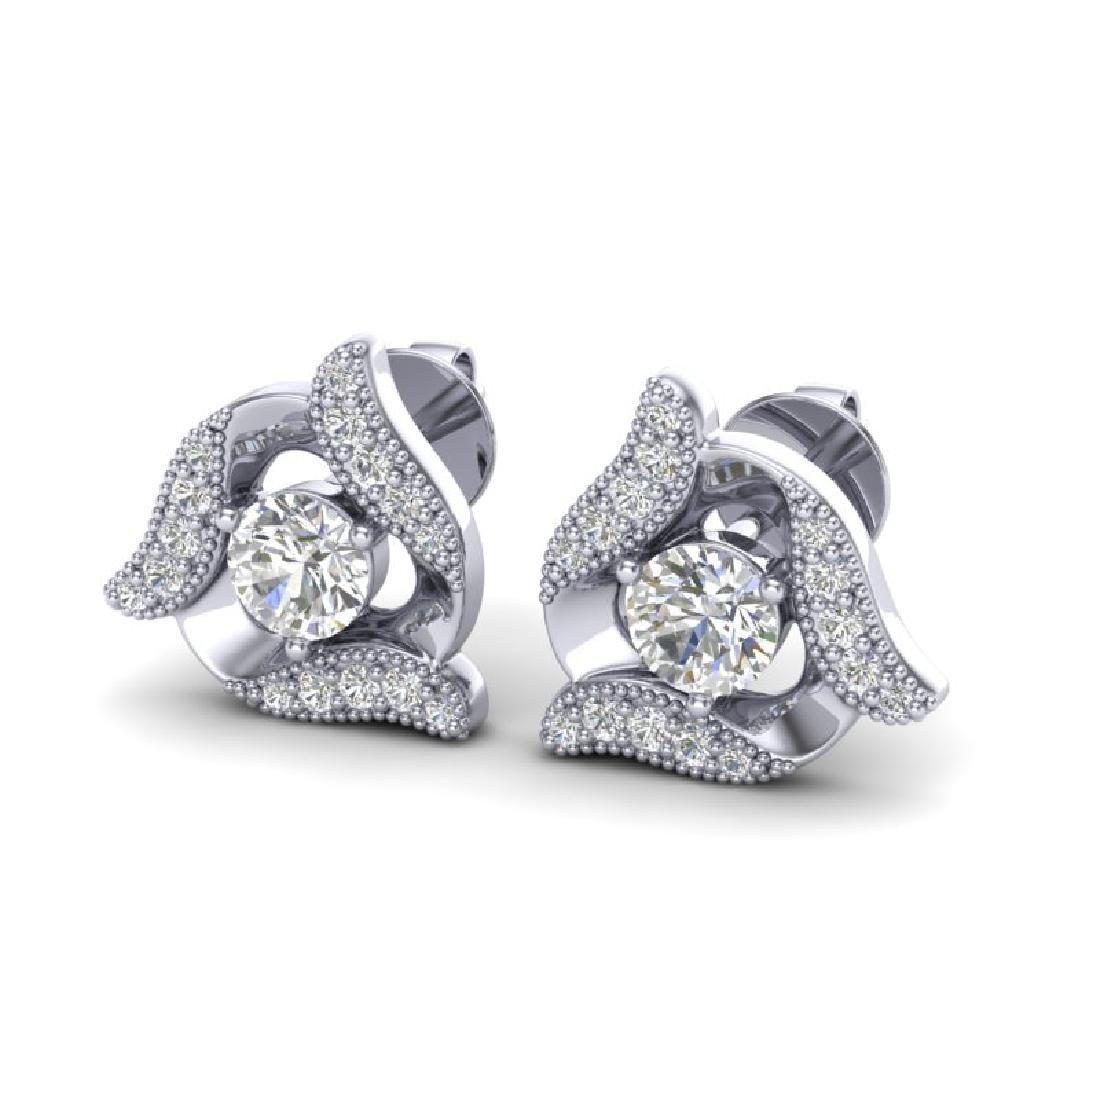 0.76 CTW Micro Pave VS/SI Diamond Halo Earrings 18K